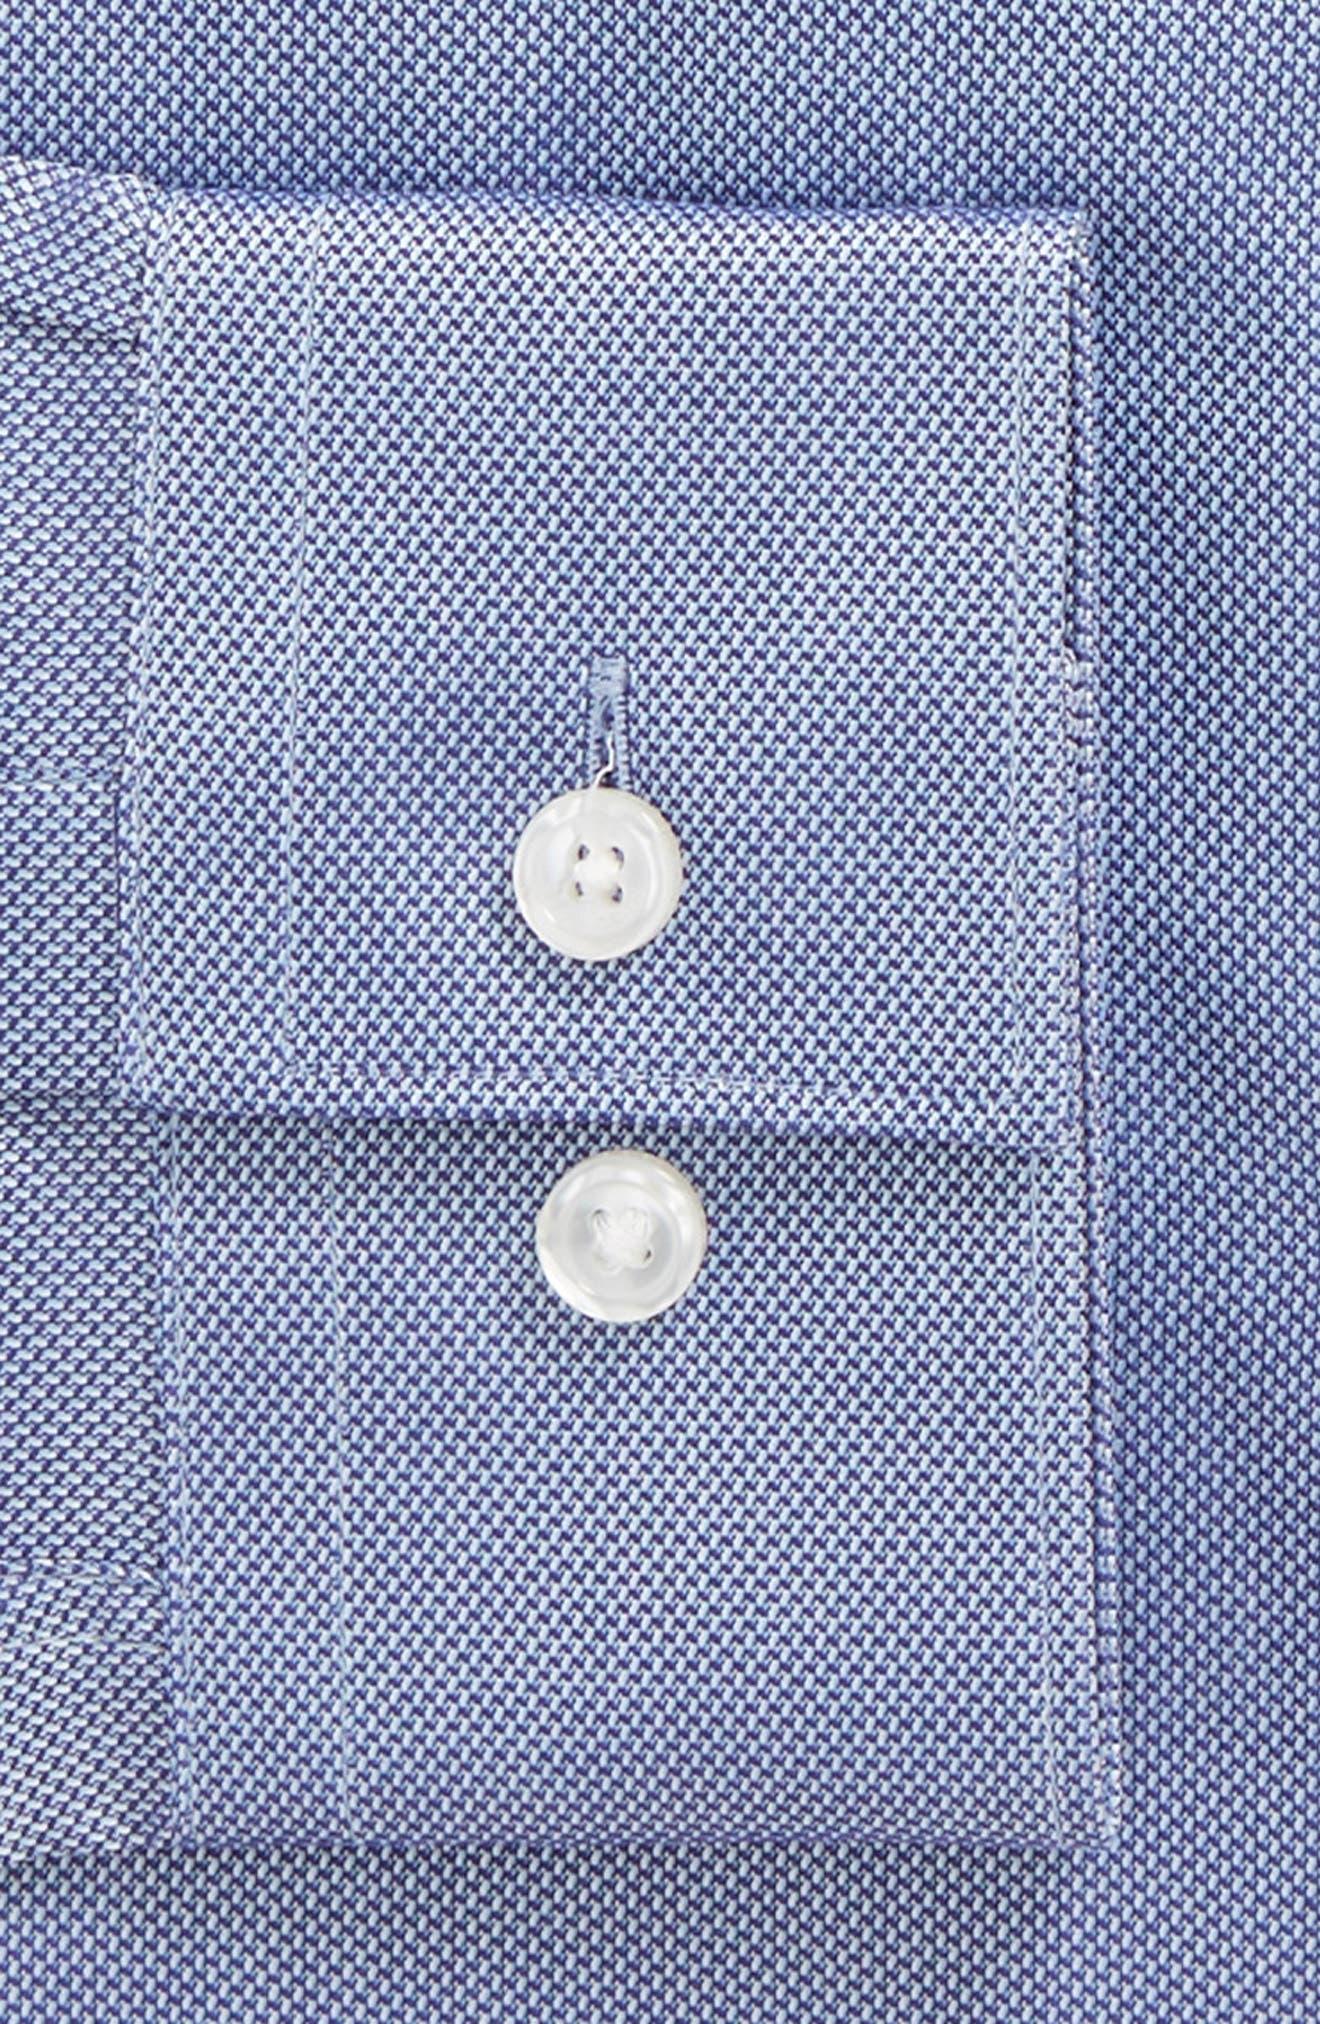 Nordstrom x BOSS Isaak Slim Fit Solid Dress Shirt,                             Alternate thumbnail 2, color,                             Blue